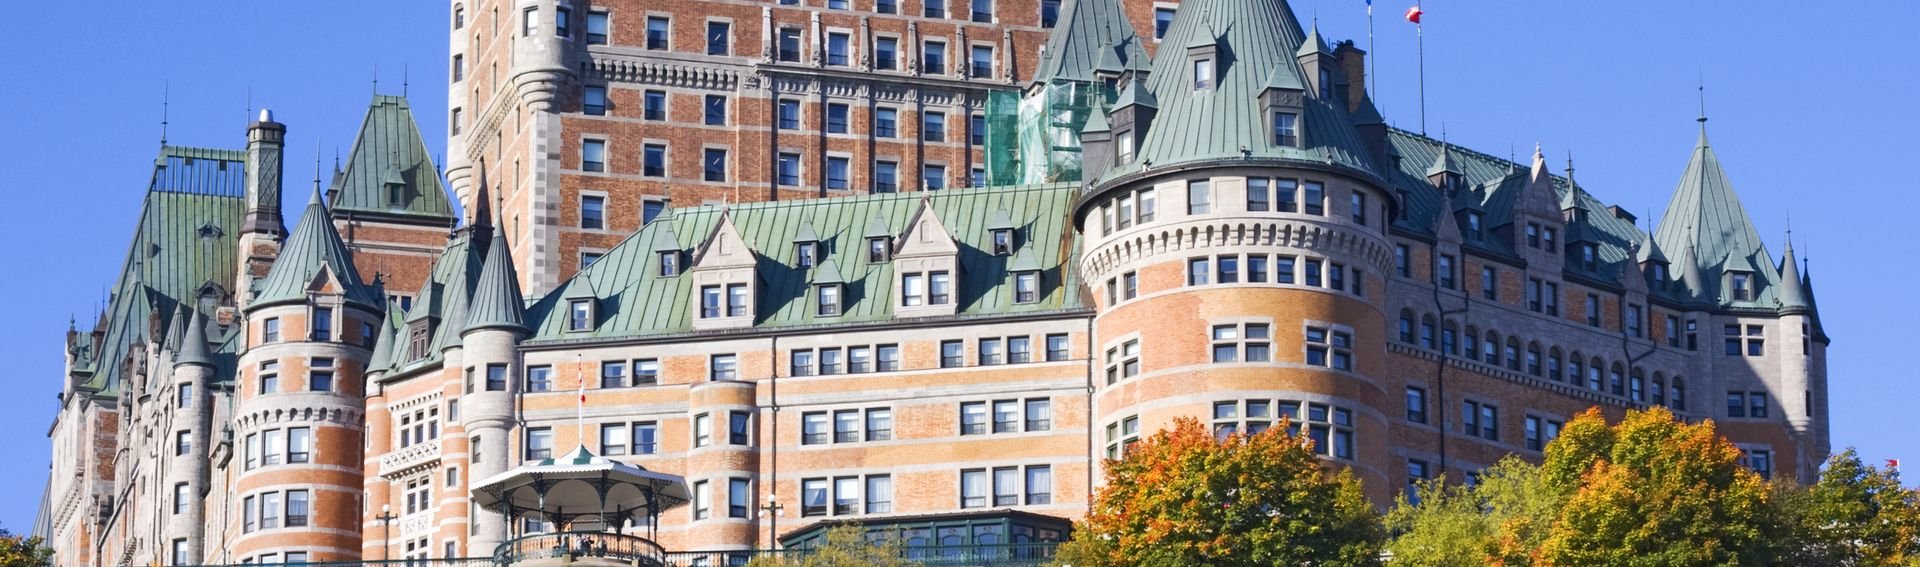 Quebec Stadt